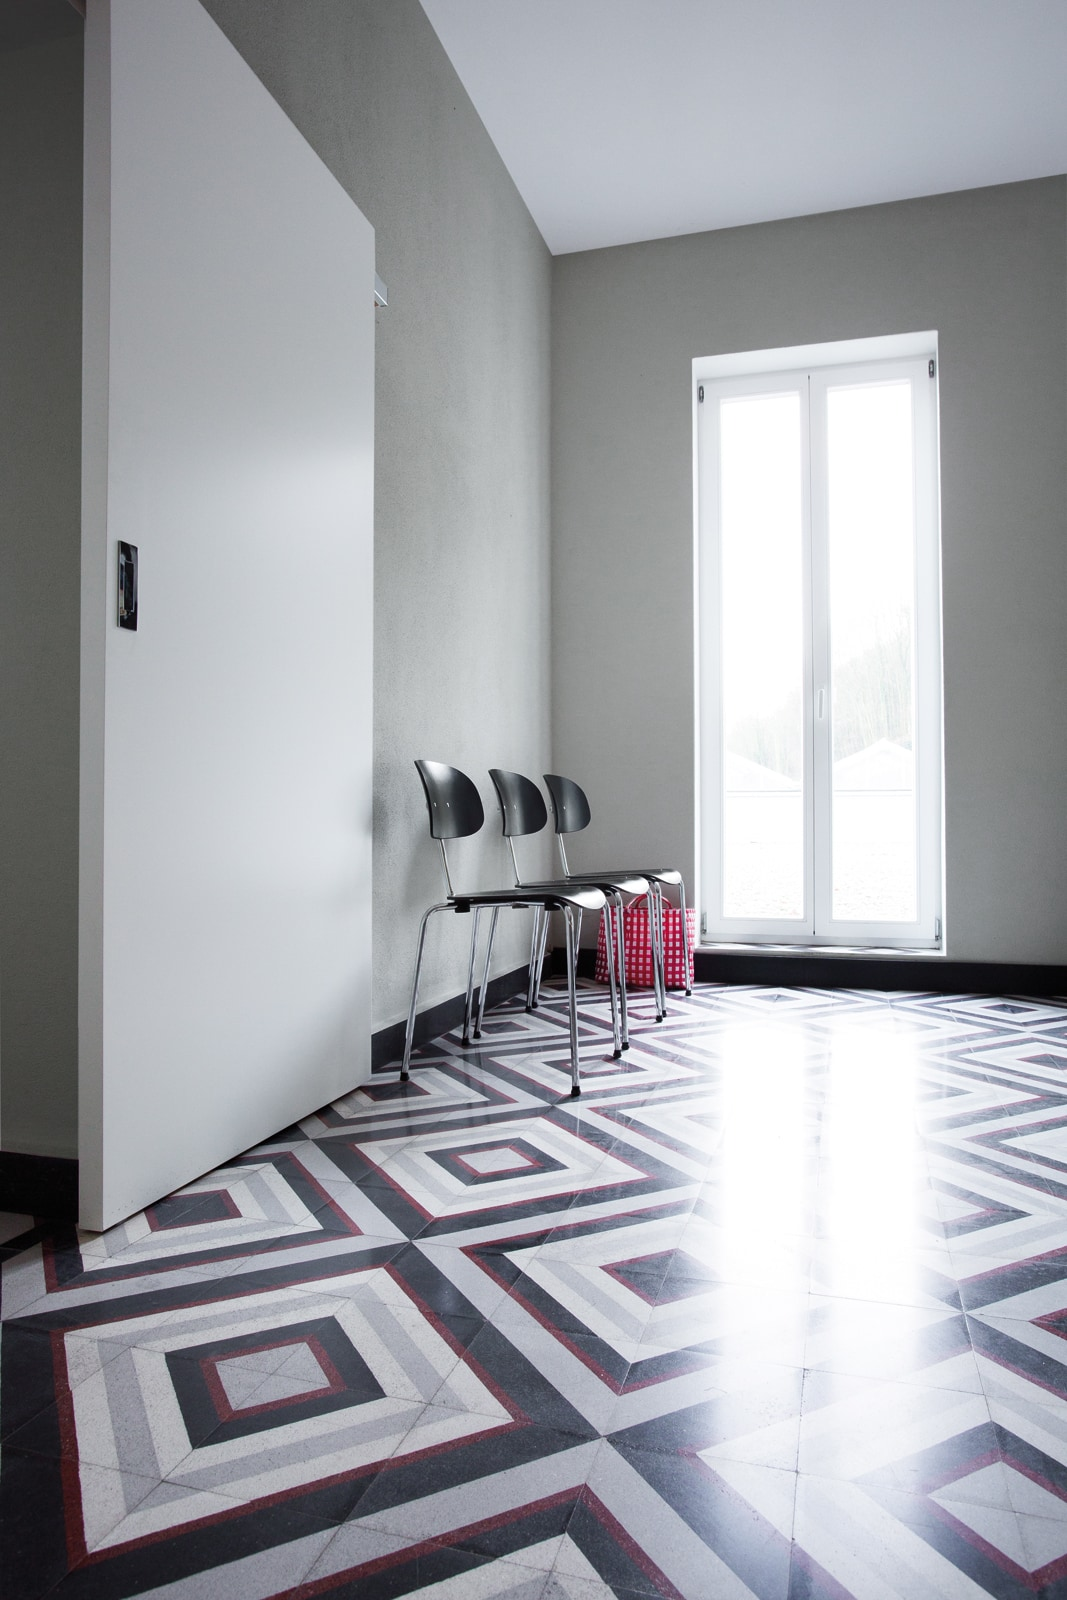 VIA-Kreidefarbe-610-Chateaugrau-Wand